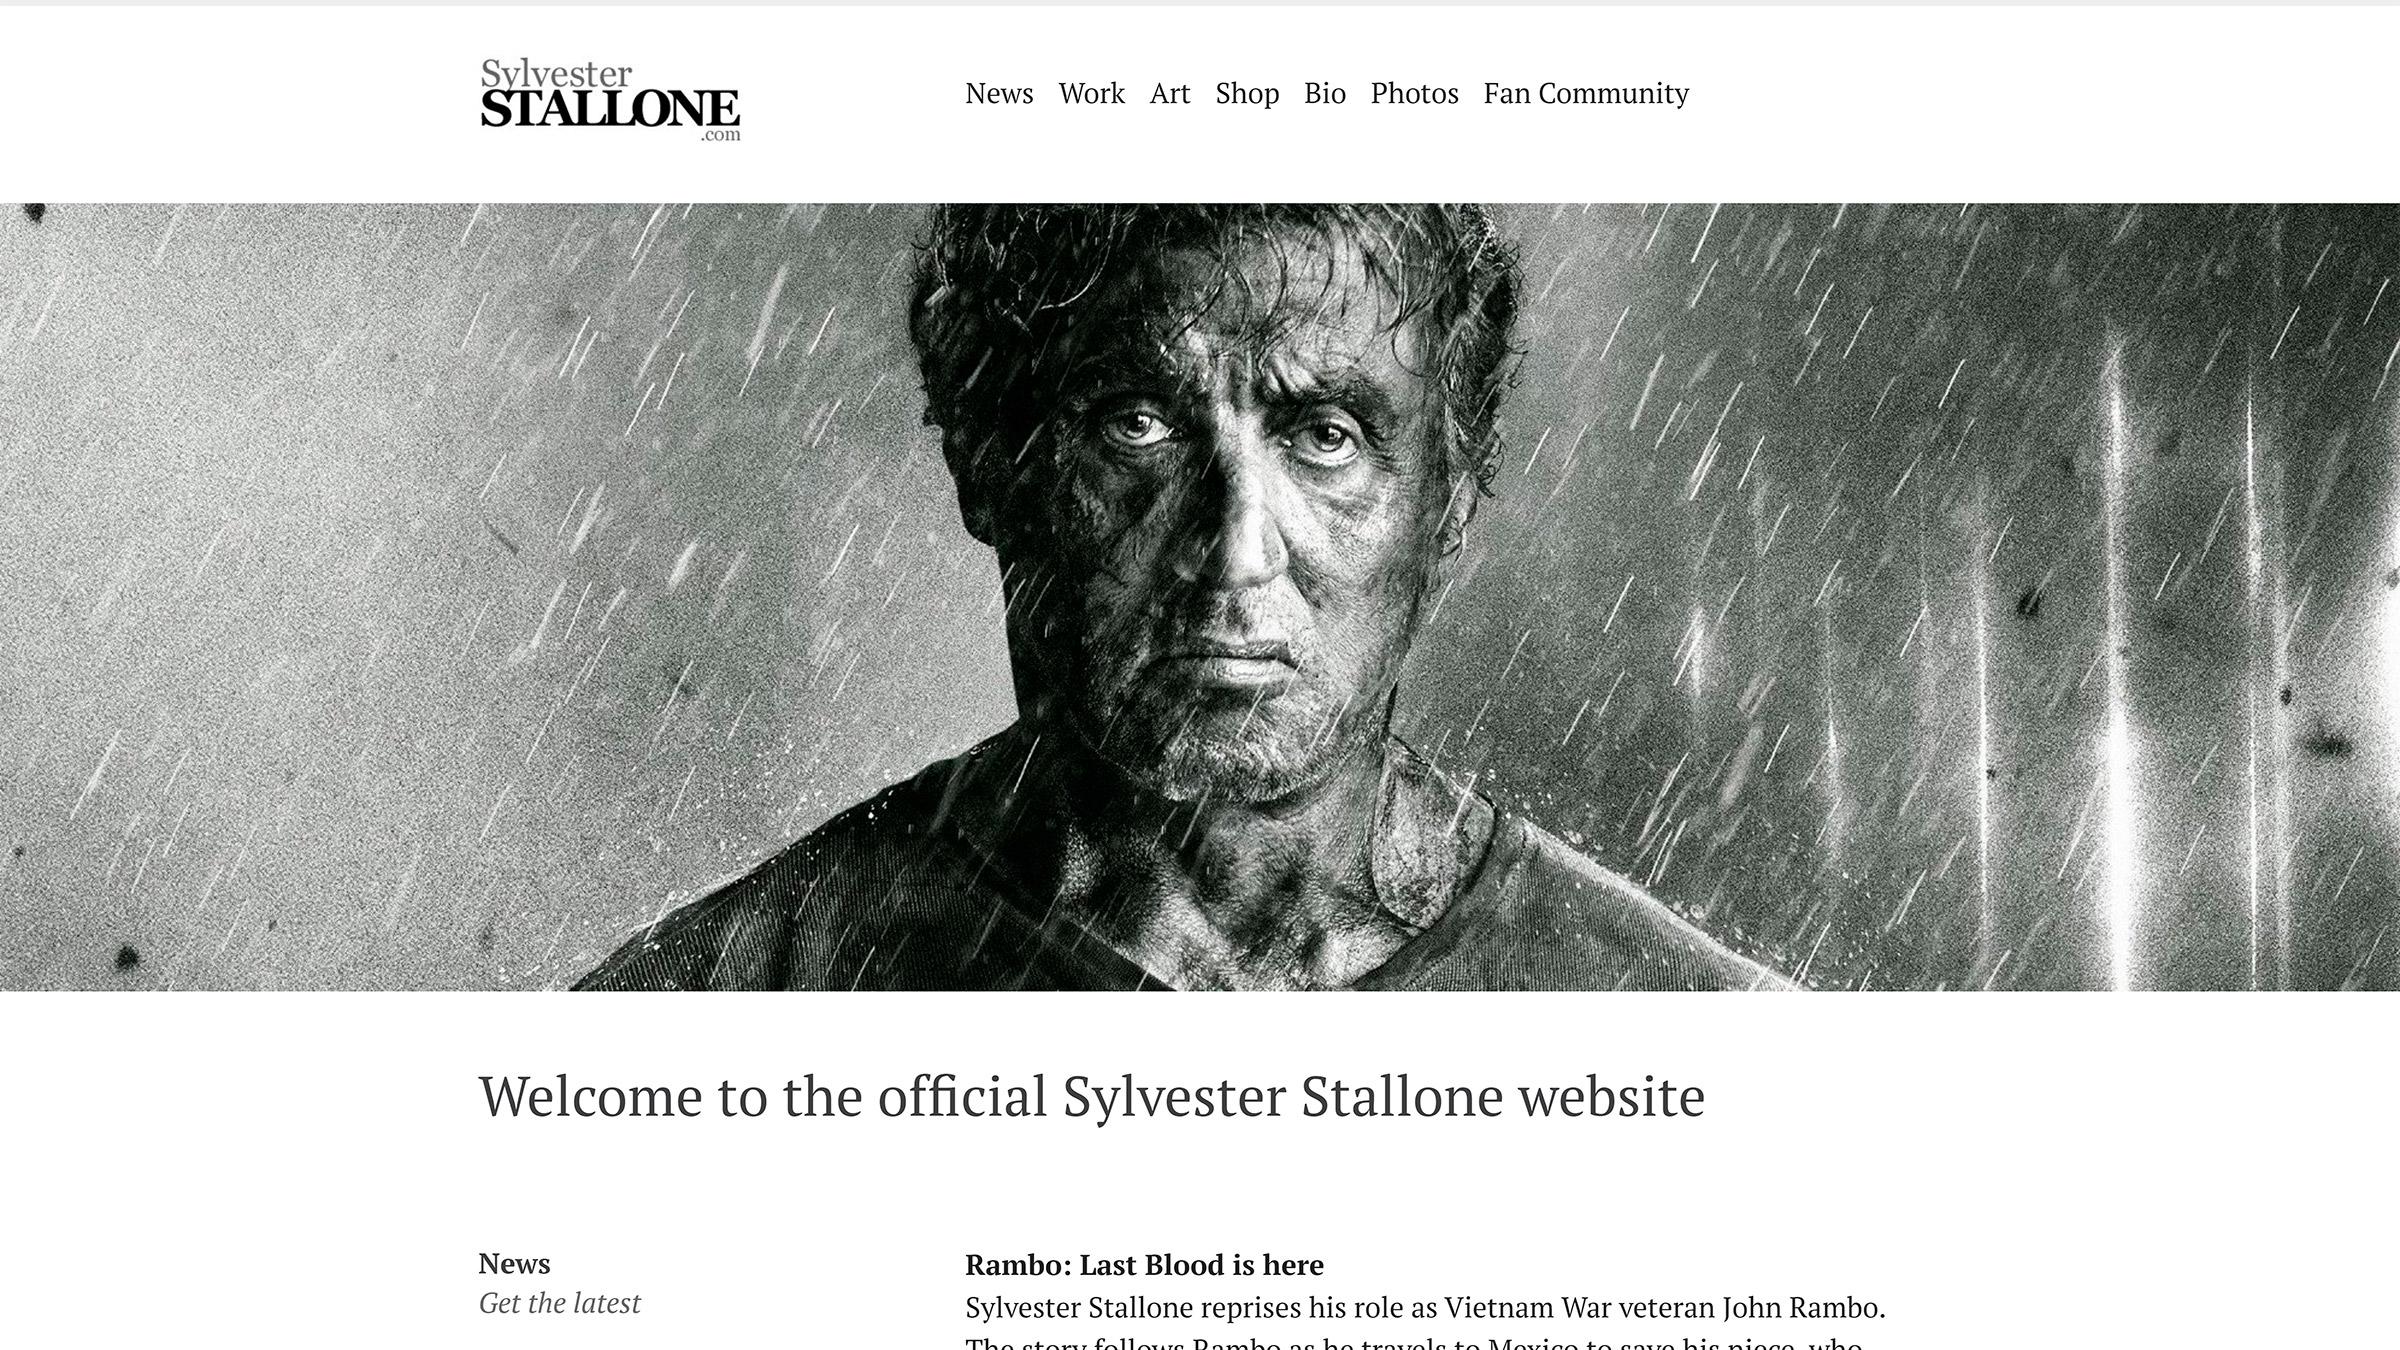 sylvester stallone site construido com wordpress